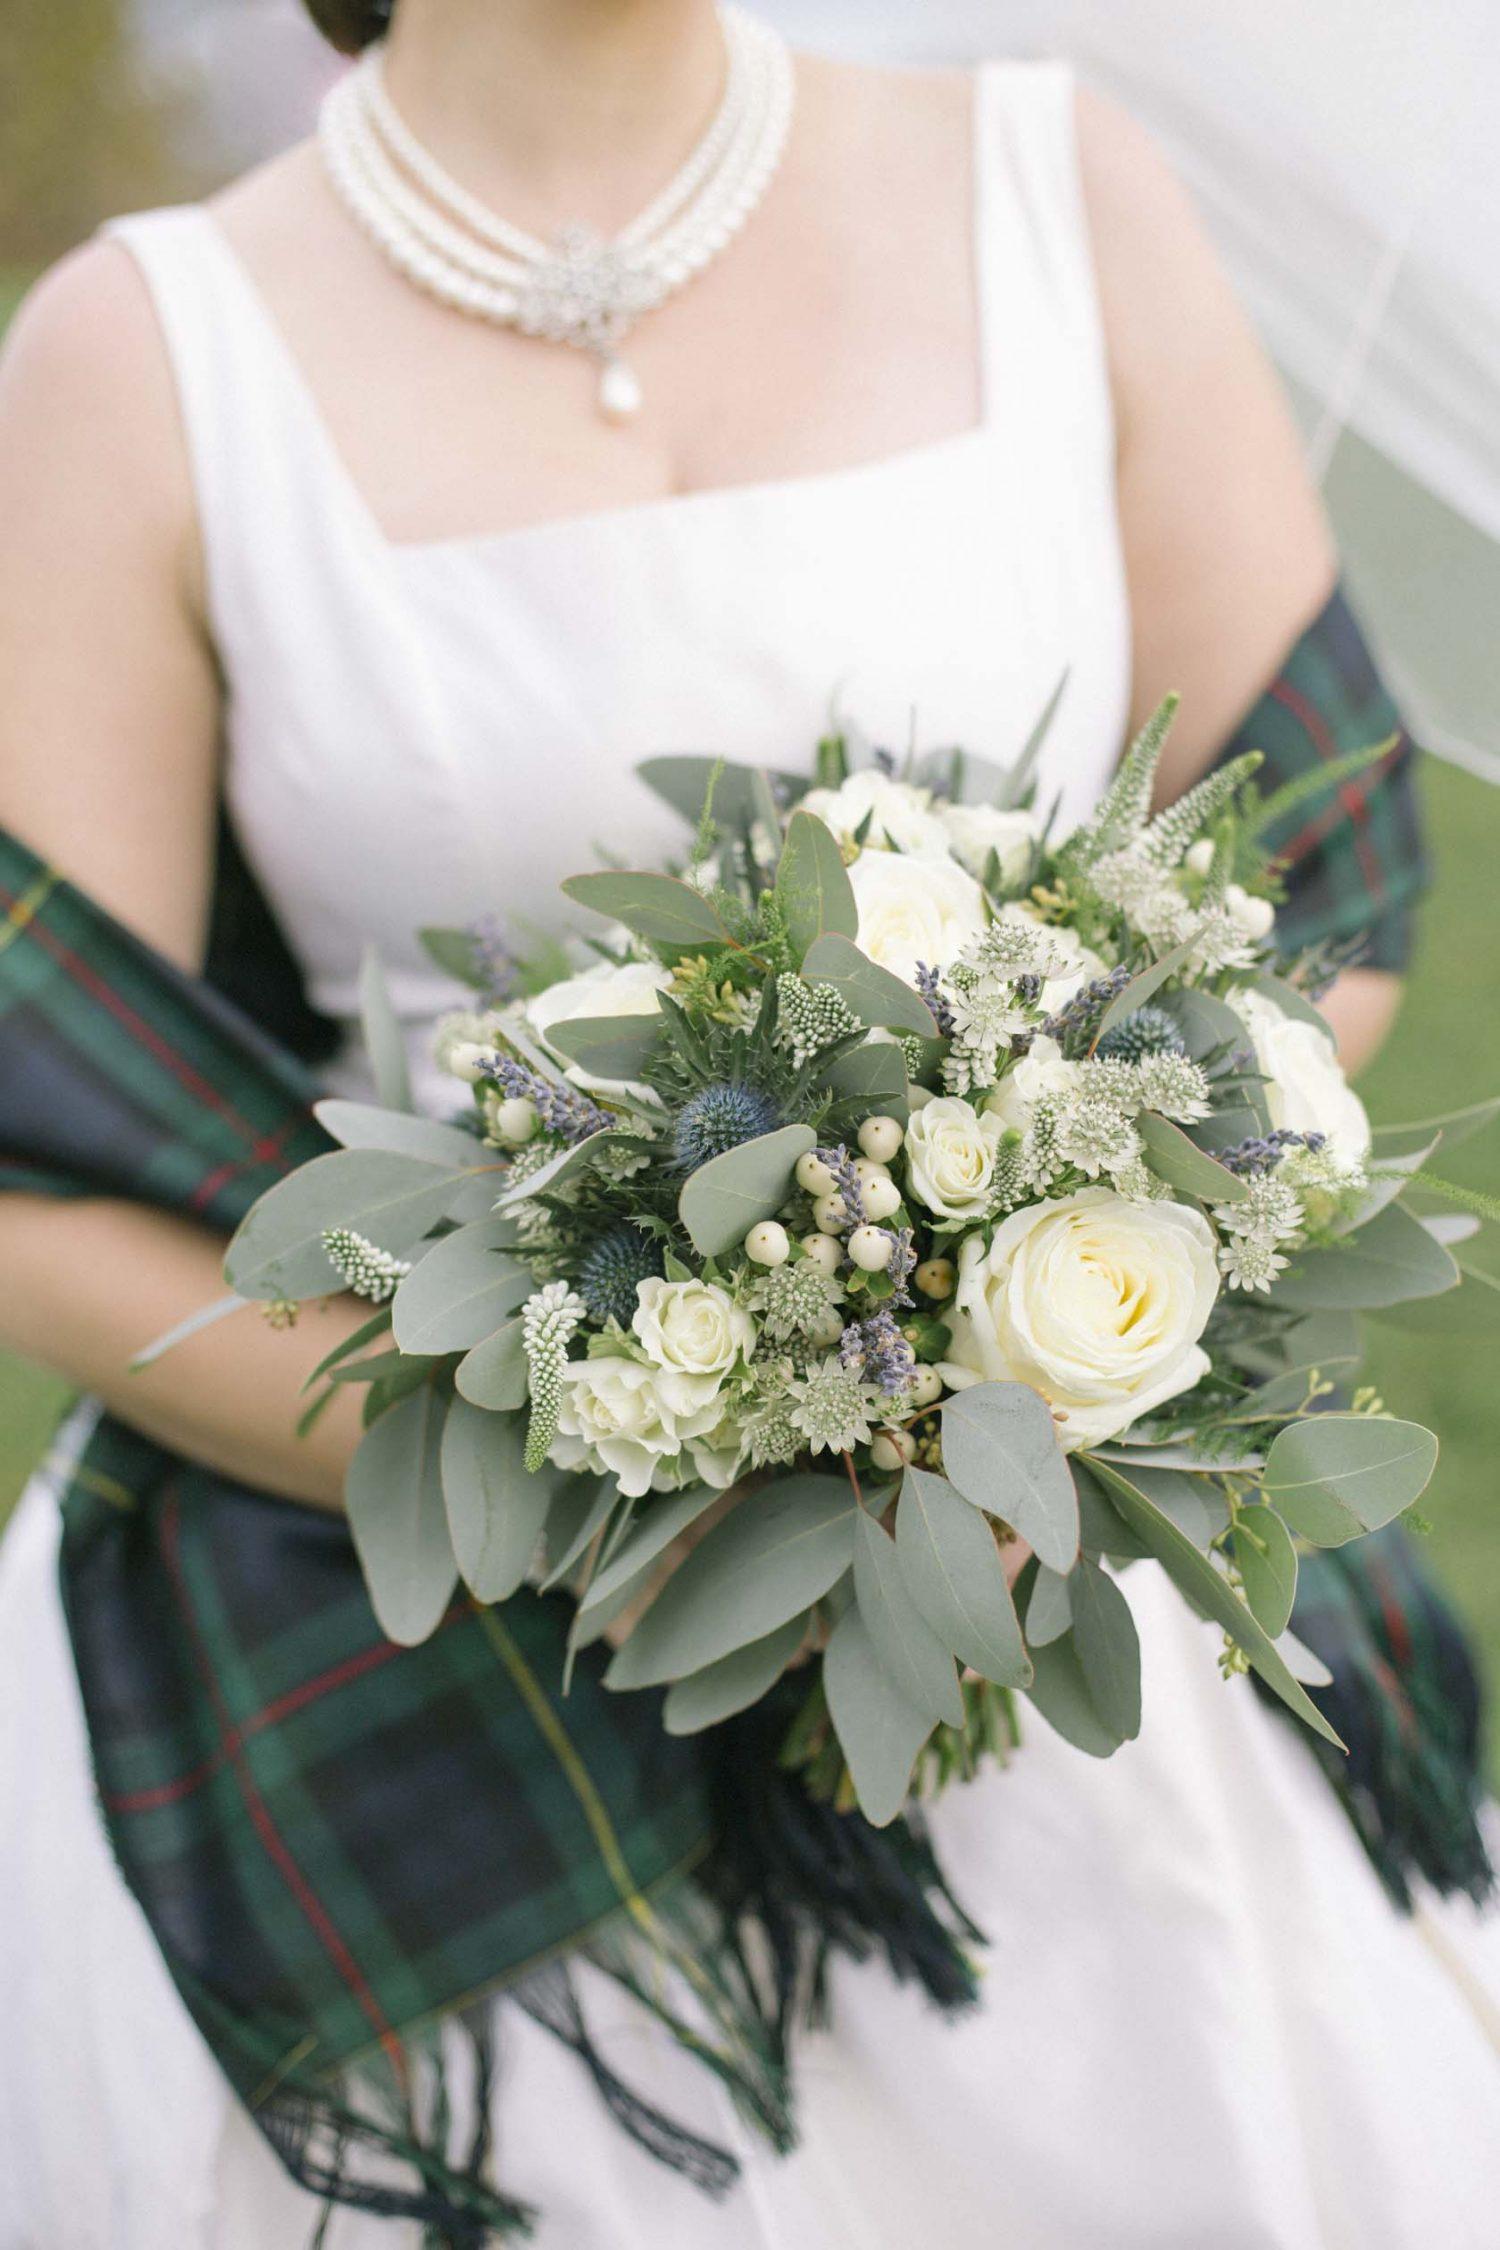 Edinburgh Castle Destination Wedding Bouquet | Edinburgh Wedding Photographer | Natural Scottish Wedding Photography | American Bride | Green Wedding Tartan